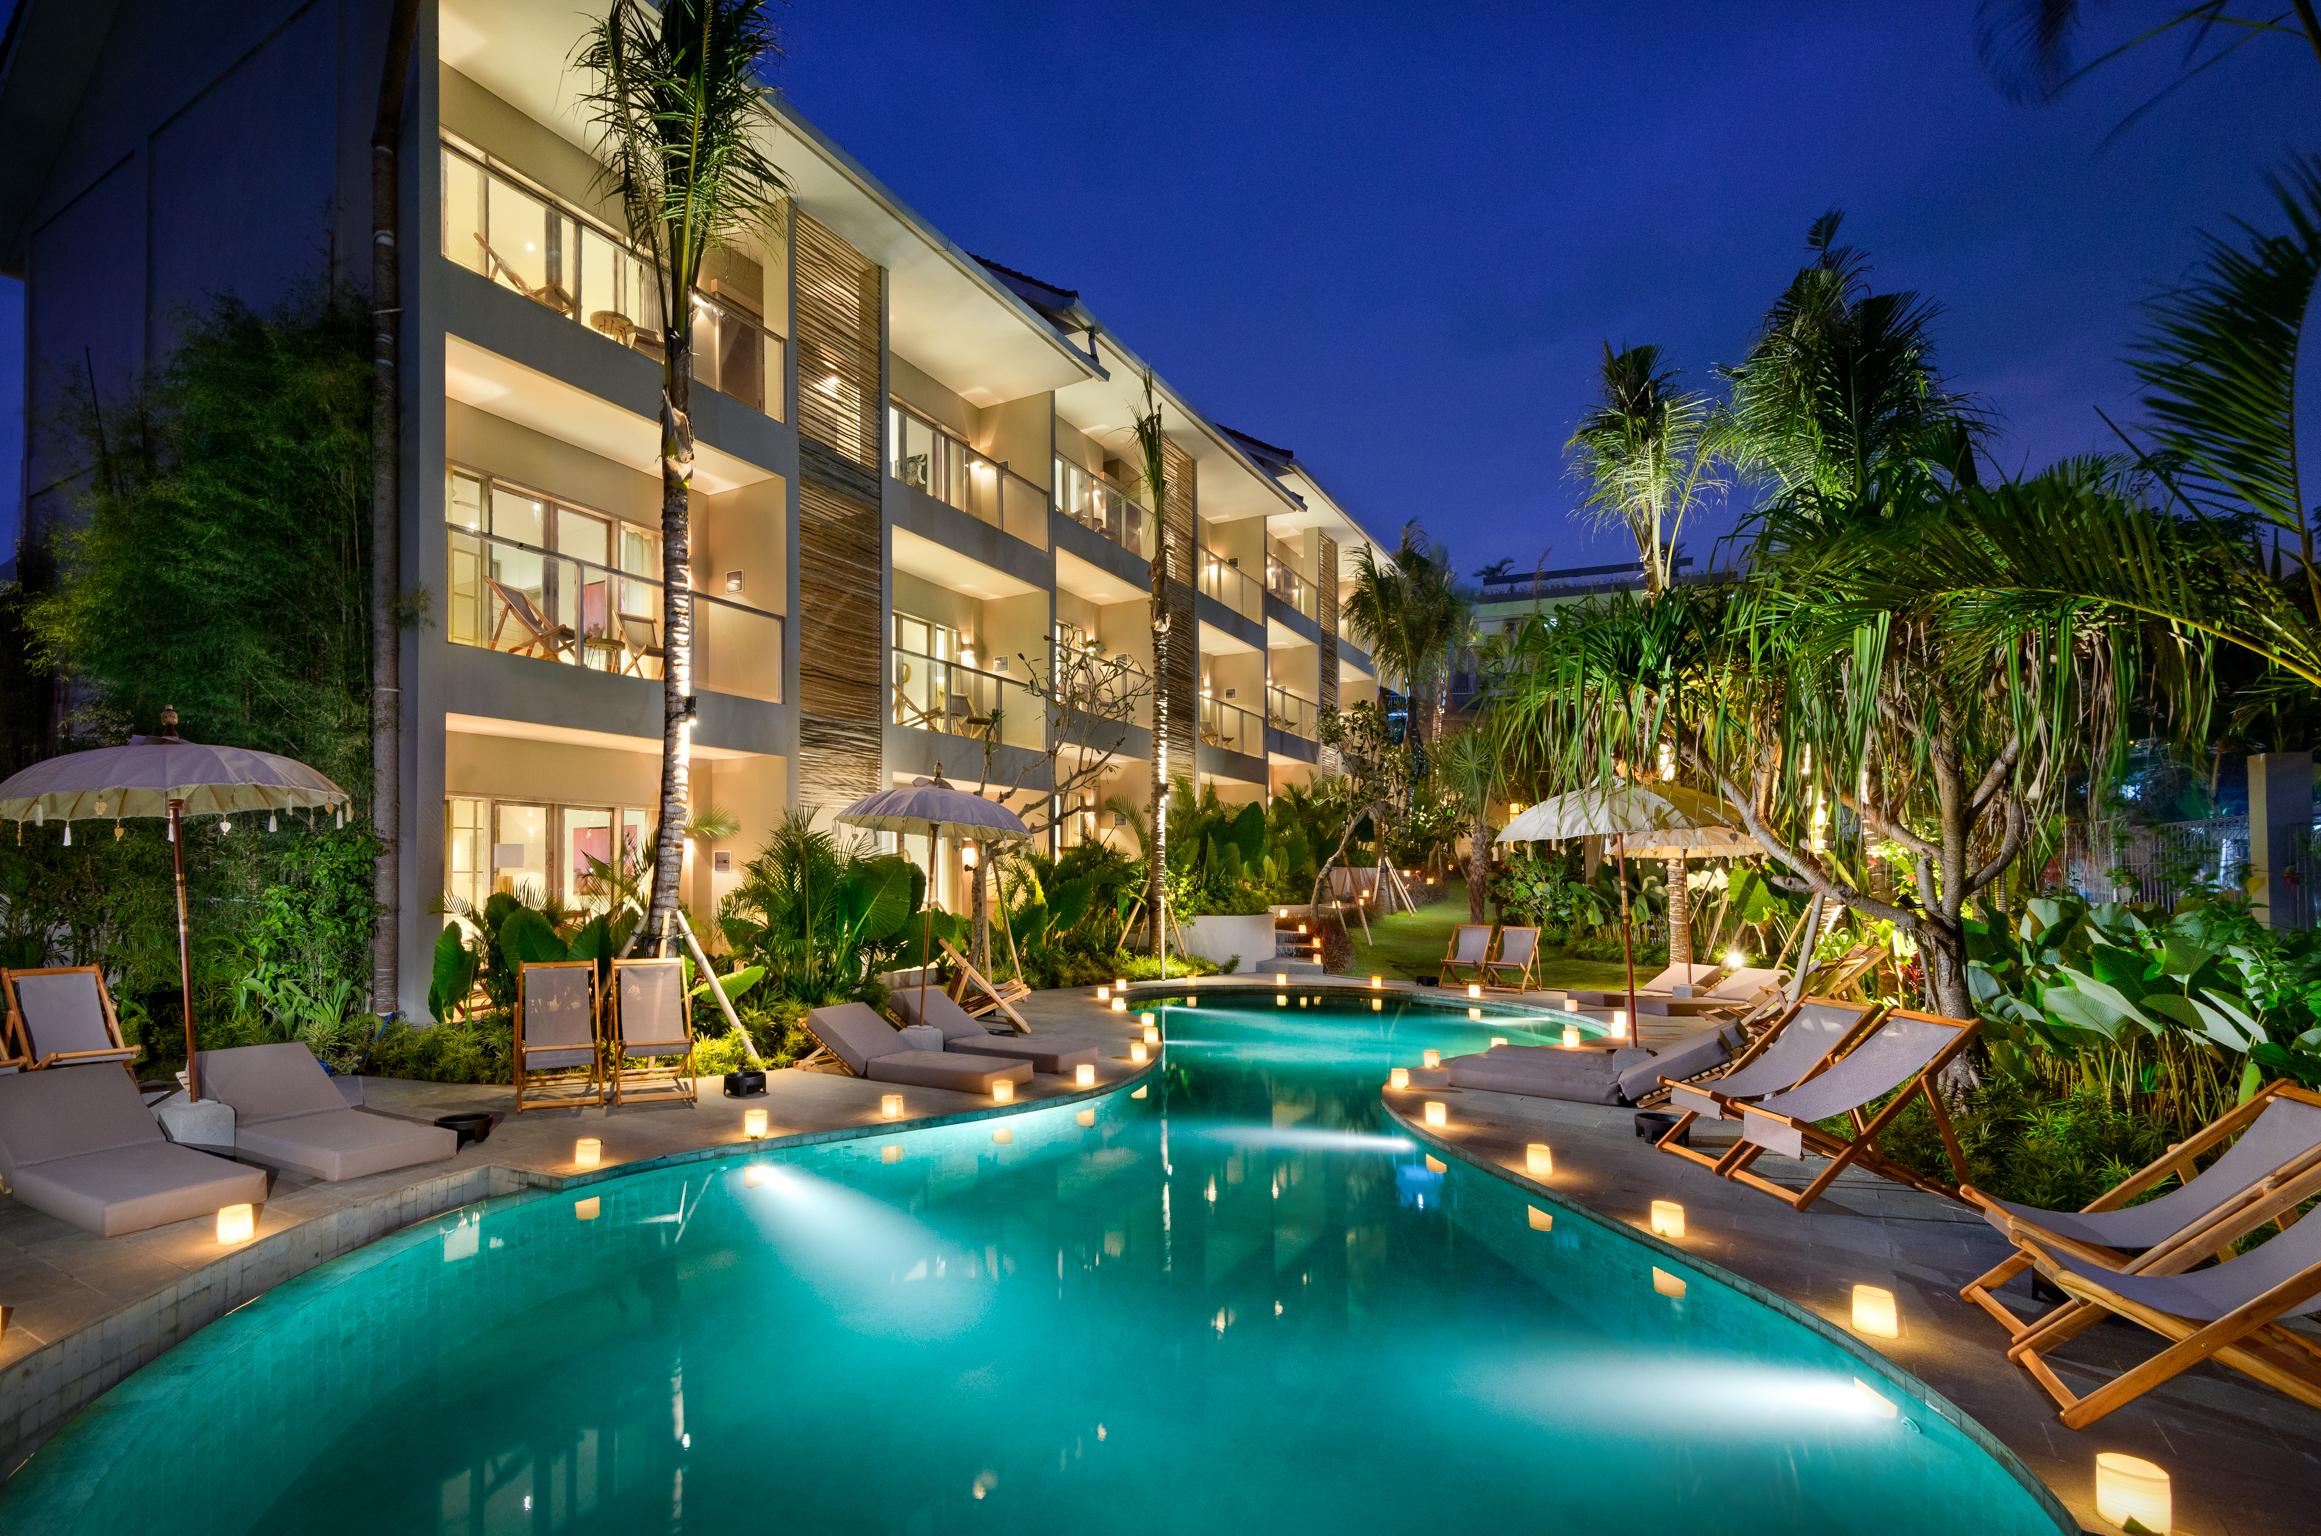 Bali Hotels Kuta Beach Club